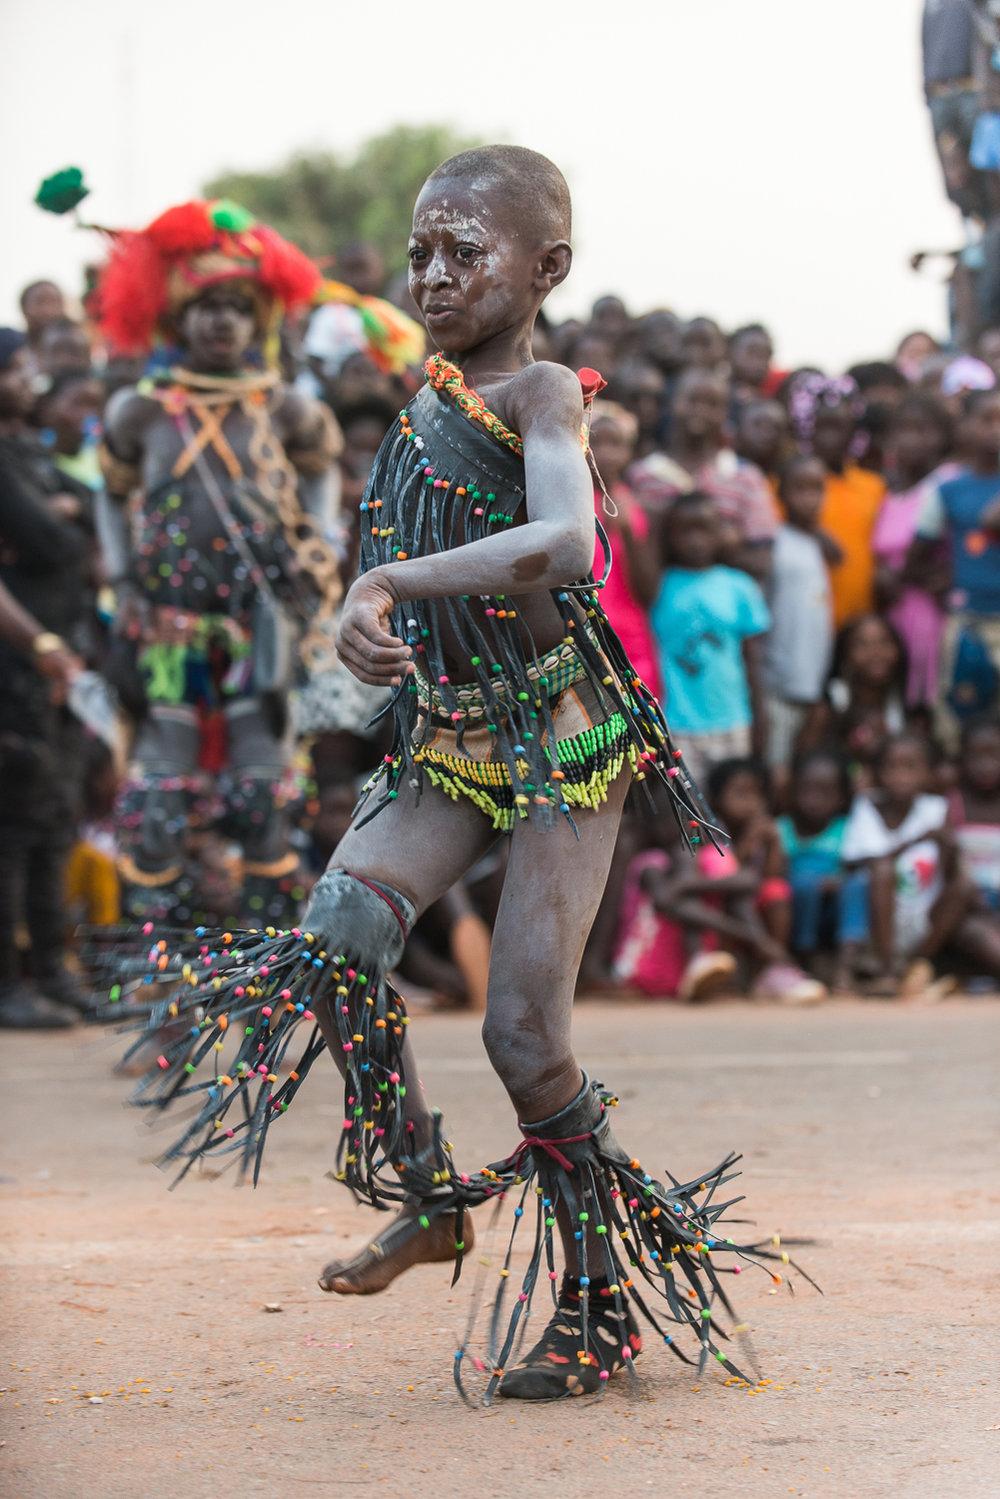 2018_02_Guinea-Bissau_Carnaval_Antula_Brandao_0055.jpg